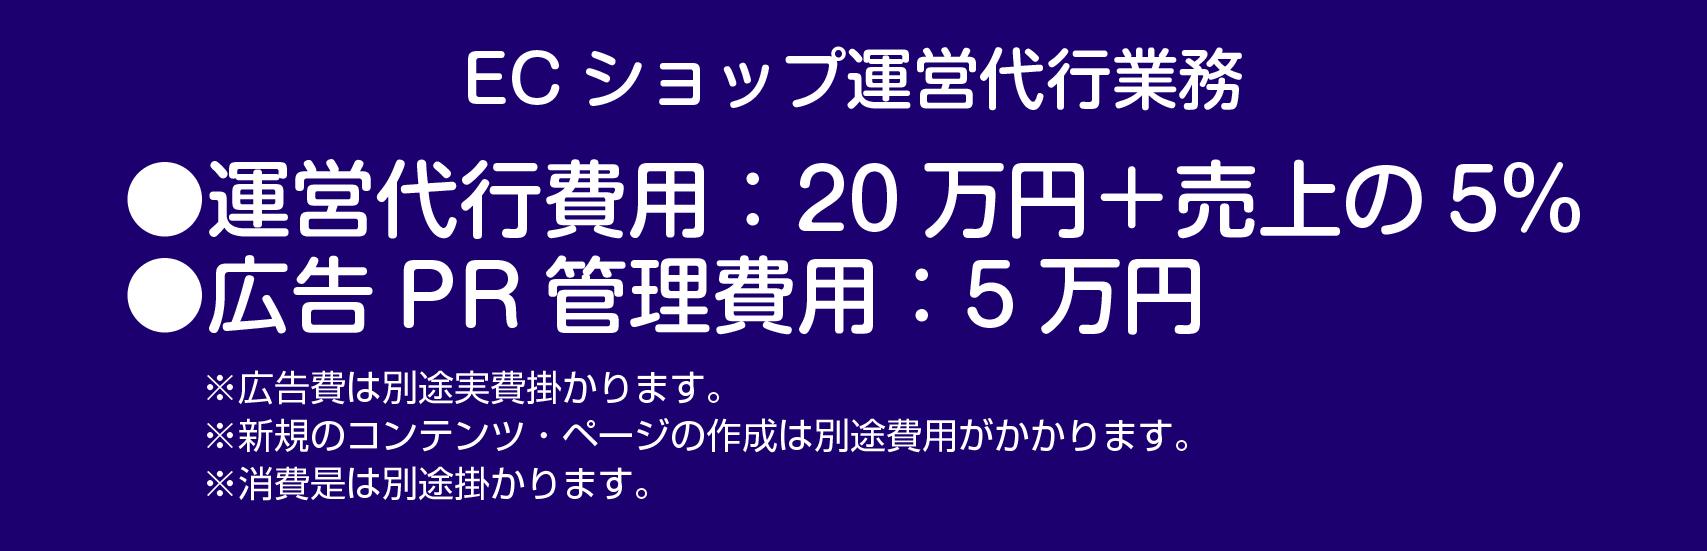 ECショップ運営位代行業務 運営代行費用:20万円+売上の5% 広告PR管理費用:5万円 ※広告費は別途実費かかります。※新規のコンテンツ・ページの作成は別途費用がかかります。※消費是は別途掛かります。